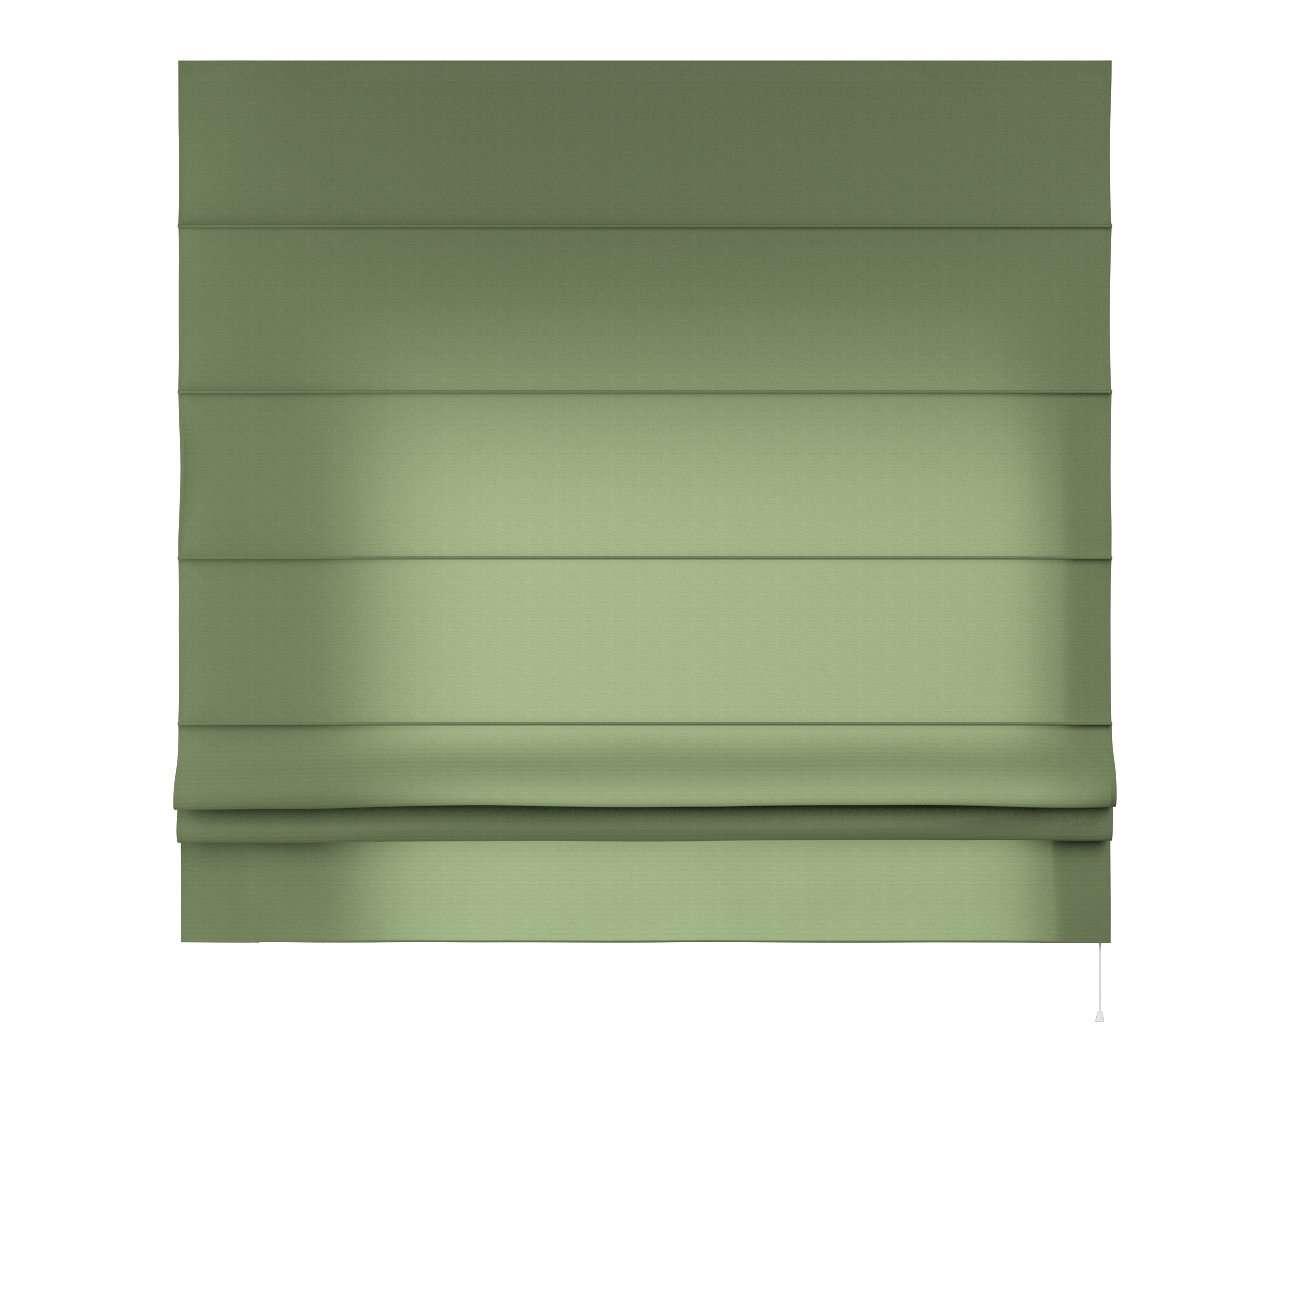 Romanetės Padva 80 x 170 cm (plotis x ilgis) kolekcijoje Jupiter, audinys: 127-52